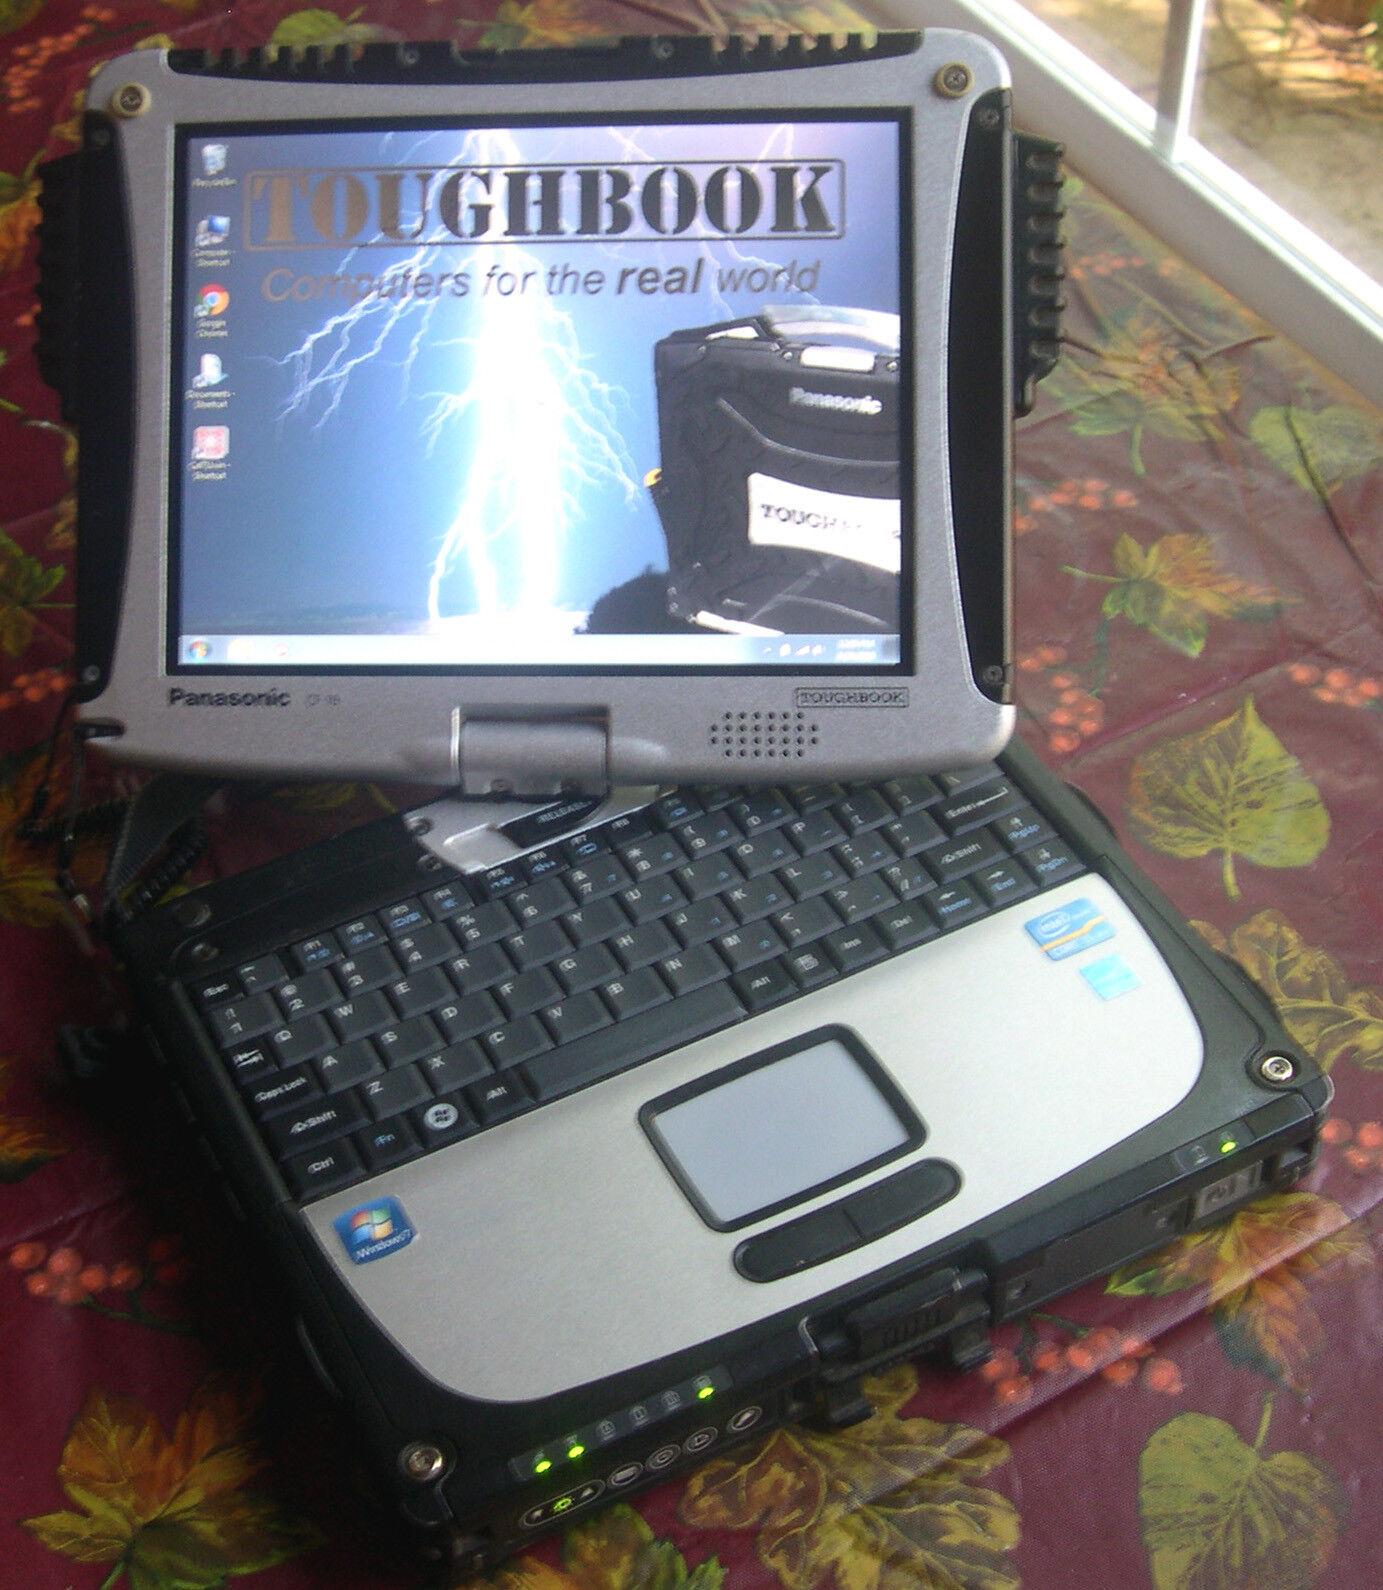 Panasonic Toughbook CF-19 i5 2.50GHz MK-5 WIN 7 LAPTOP VERY CLEAN TOUCHSCREEN